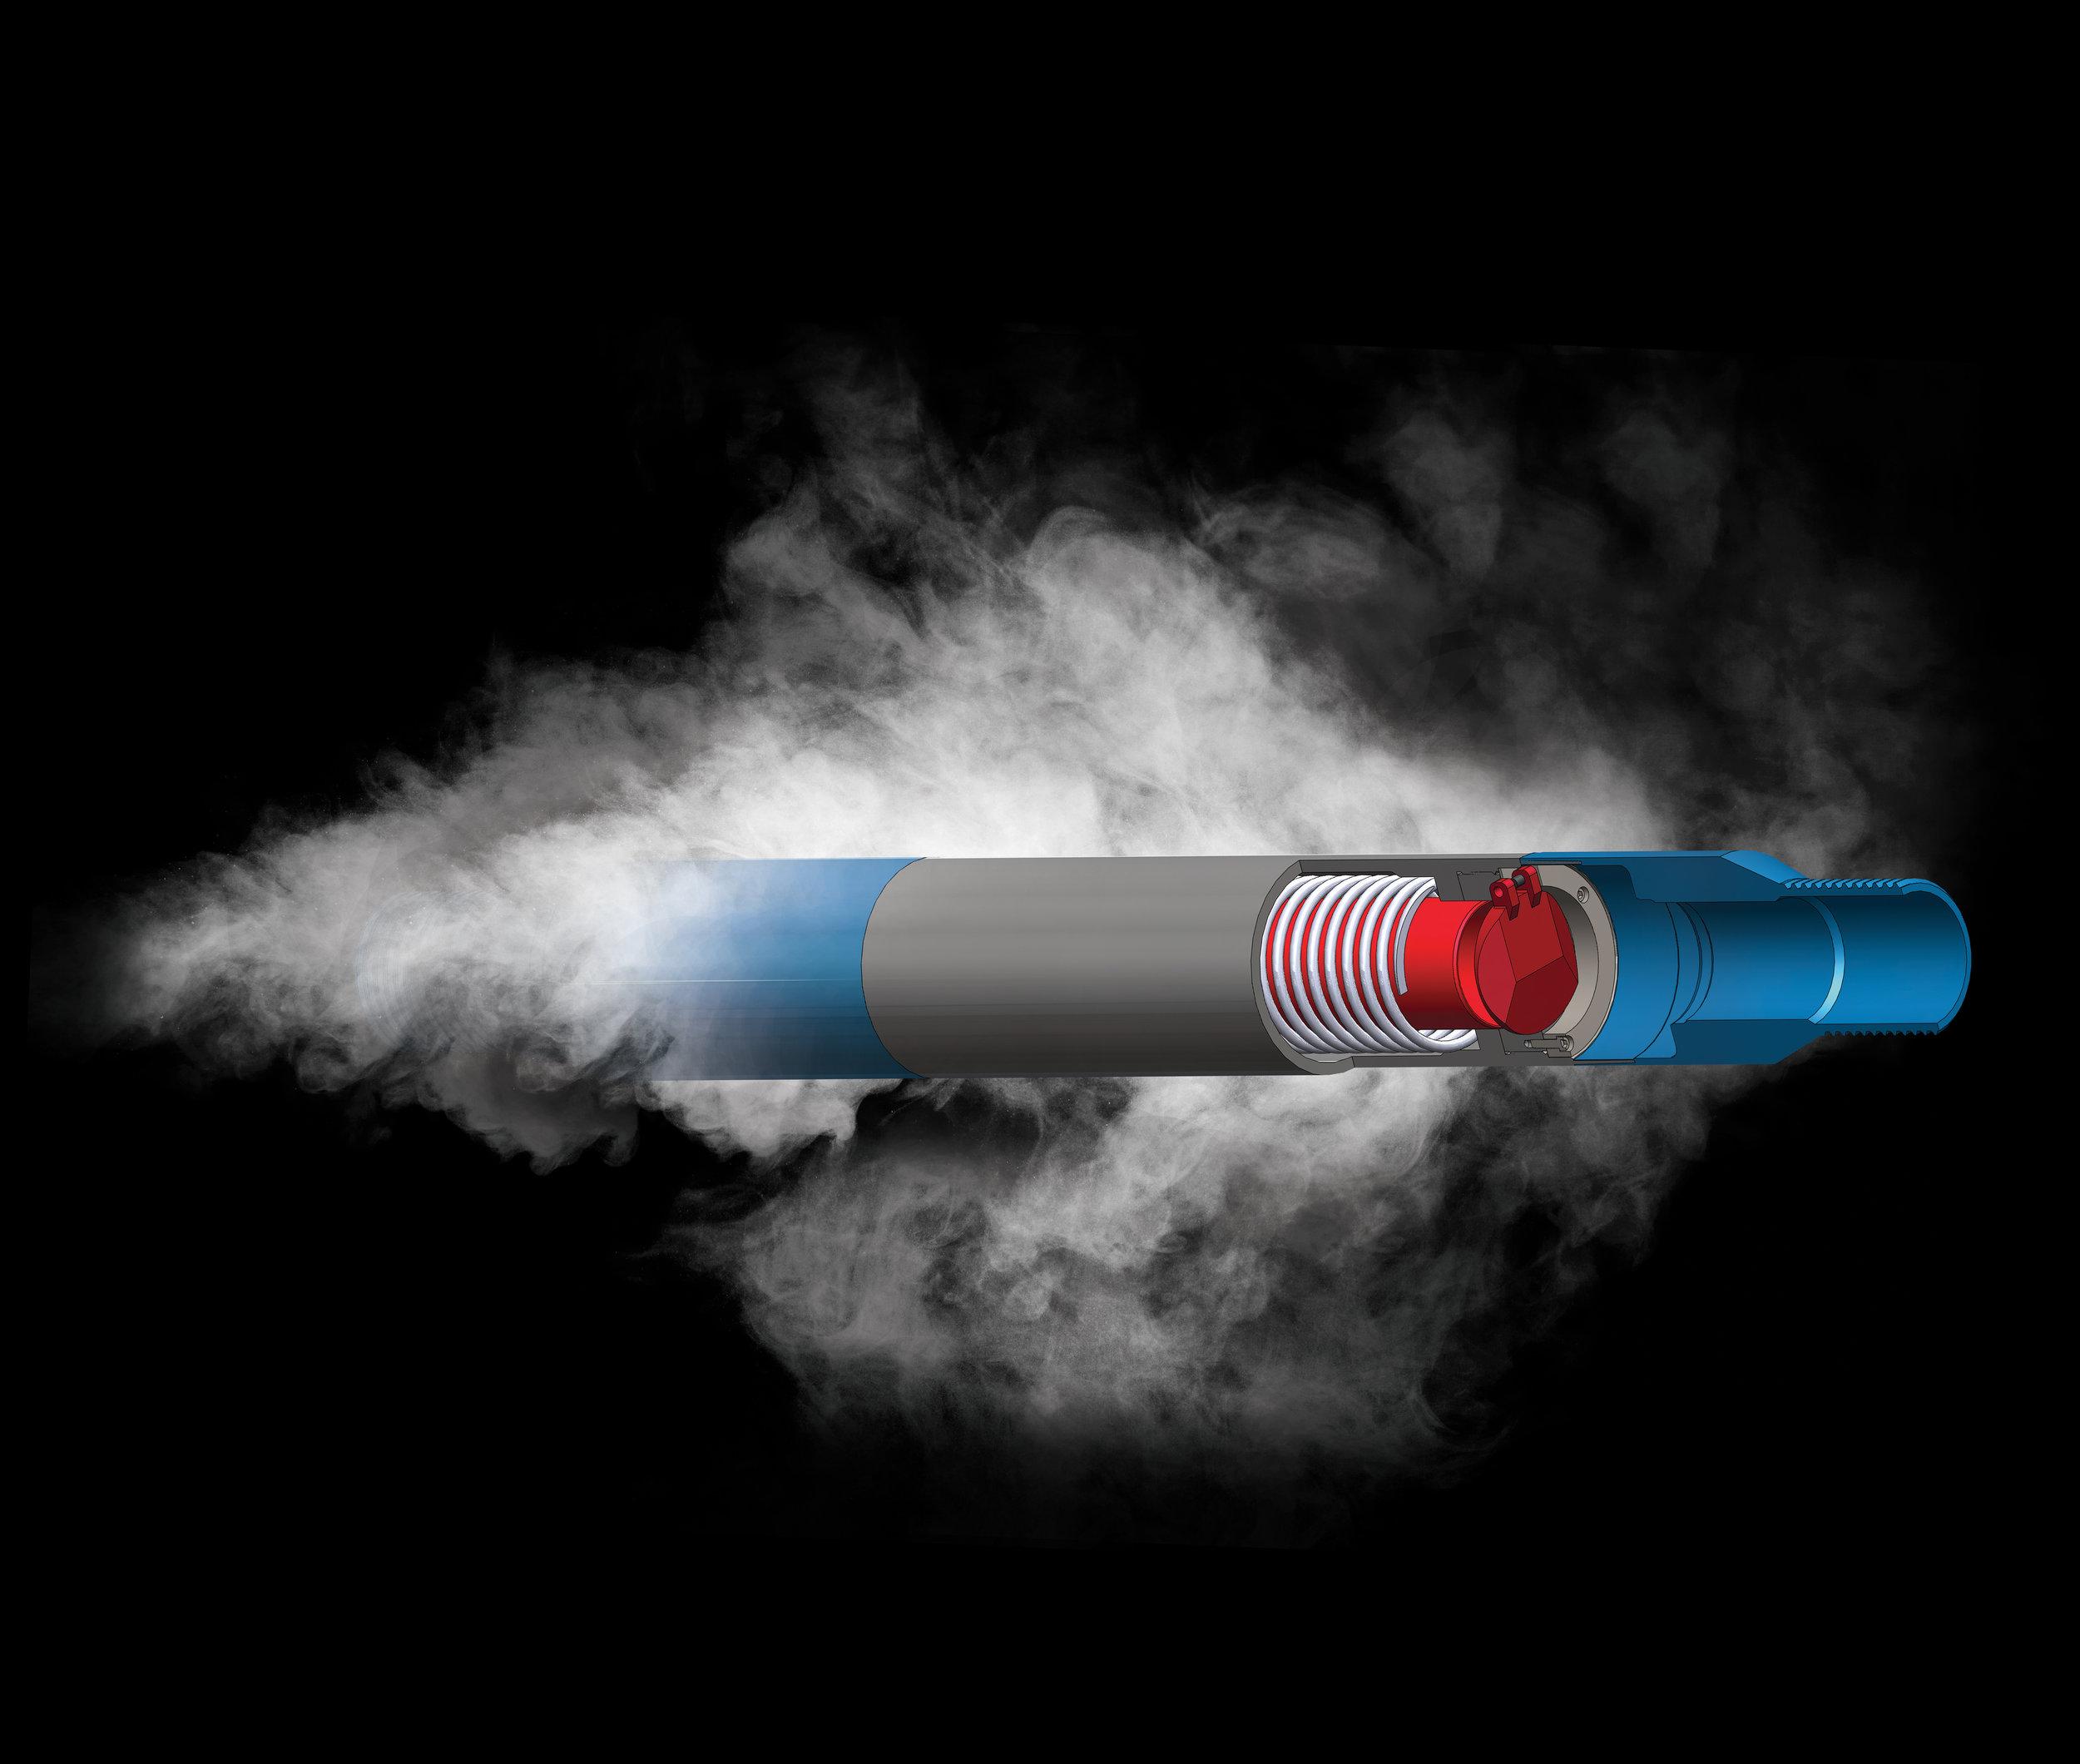 Conceptual illustration of Pragma's Downhole Steam Injection Valve